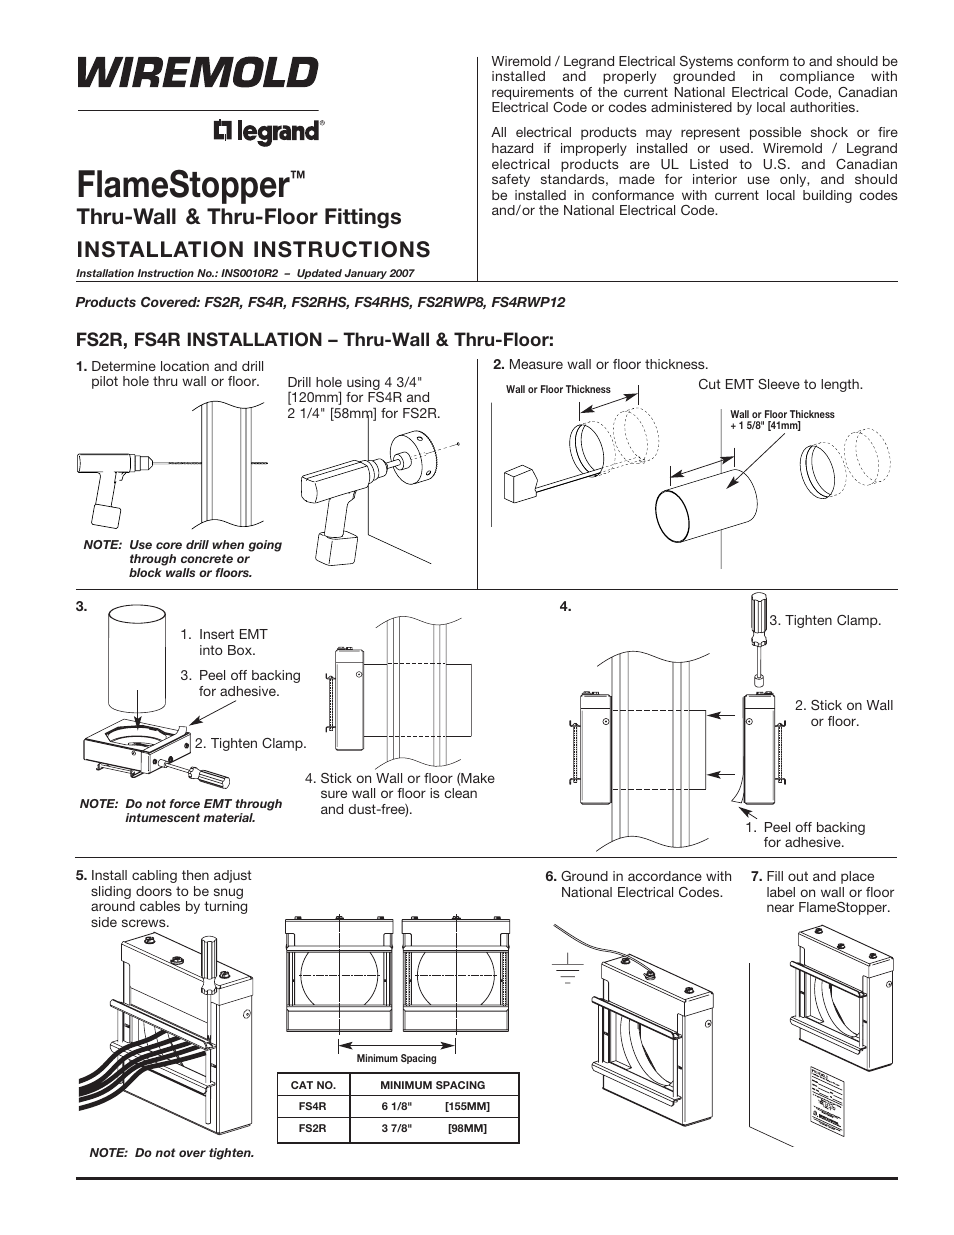 Legrand Fs User Manual 8 Pages Also For Bztpp Series Rc3aptcbk Le Grand Cat 6 Cable Wiring Diagram Rc3aptcgy Rc4ktcbk Rc4ktcgy Rc4ktcvy Rc4ktcal Rc4ktcbs Rc4ktcab Rc9 Poke Thru